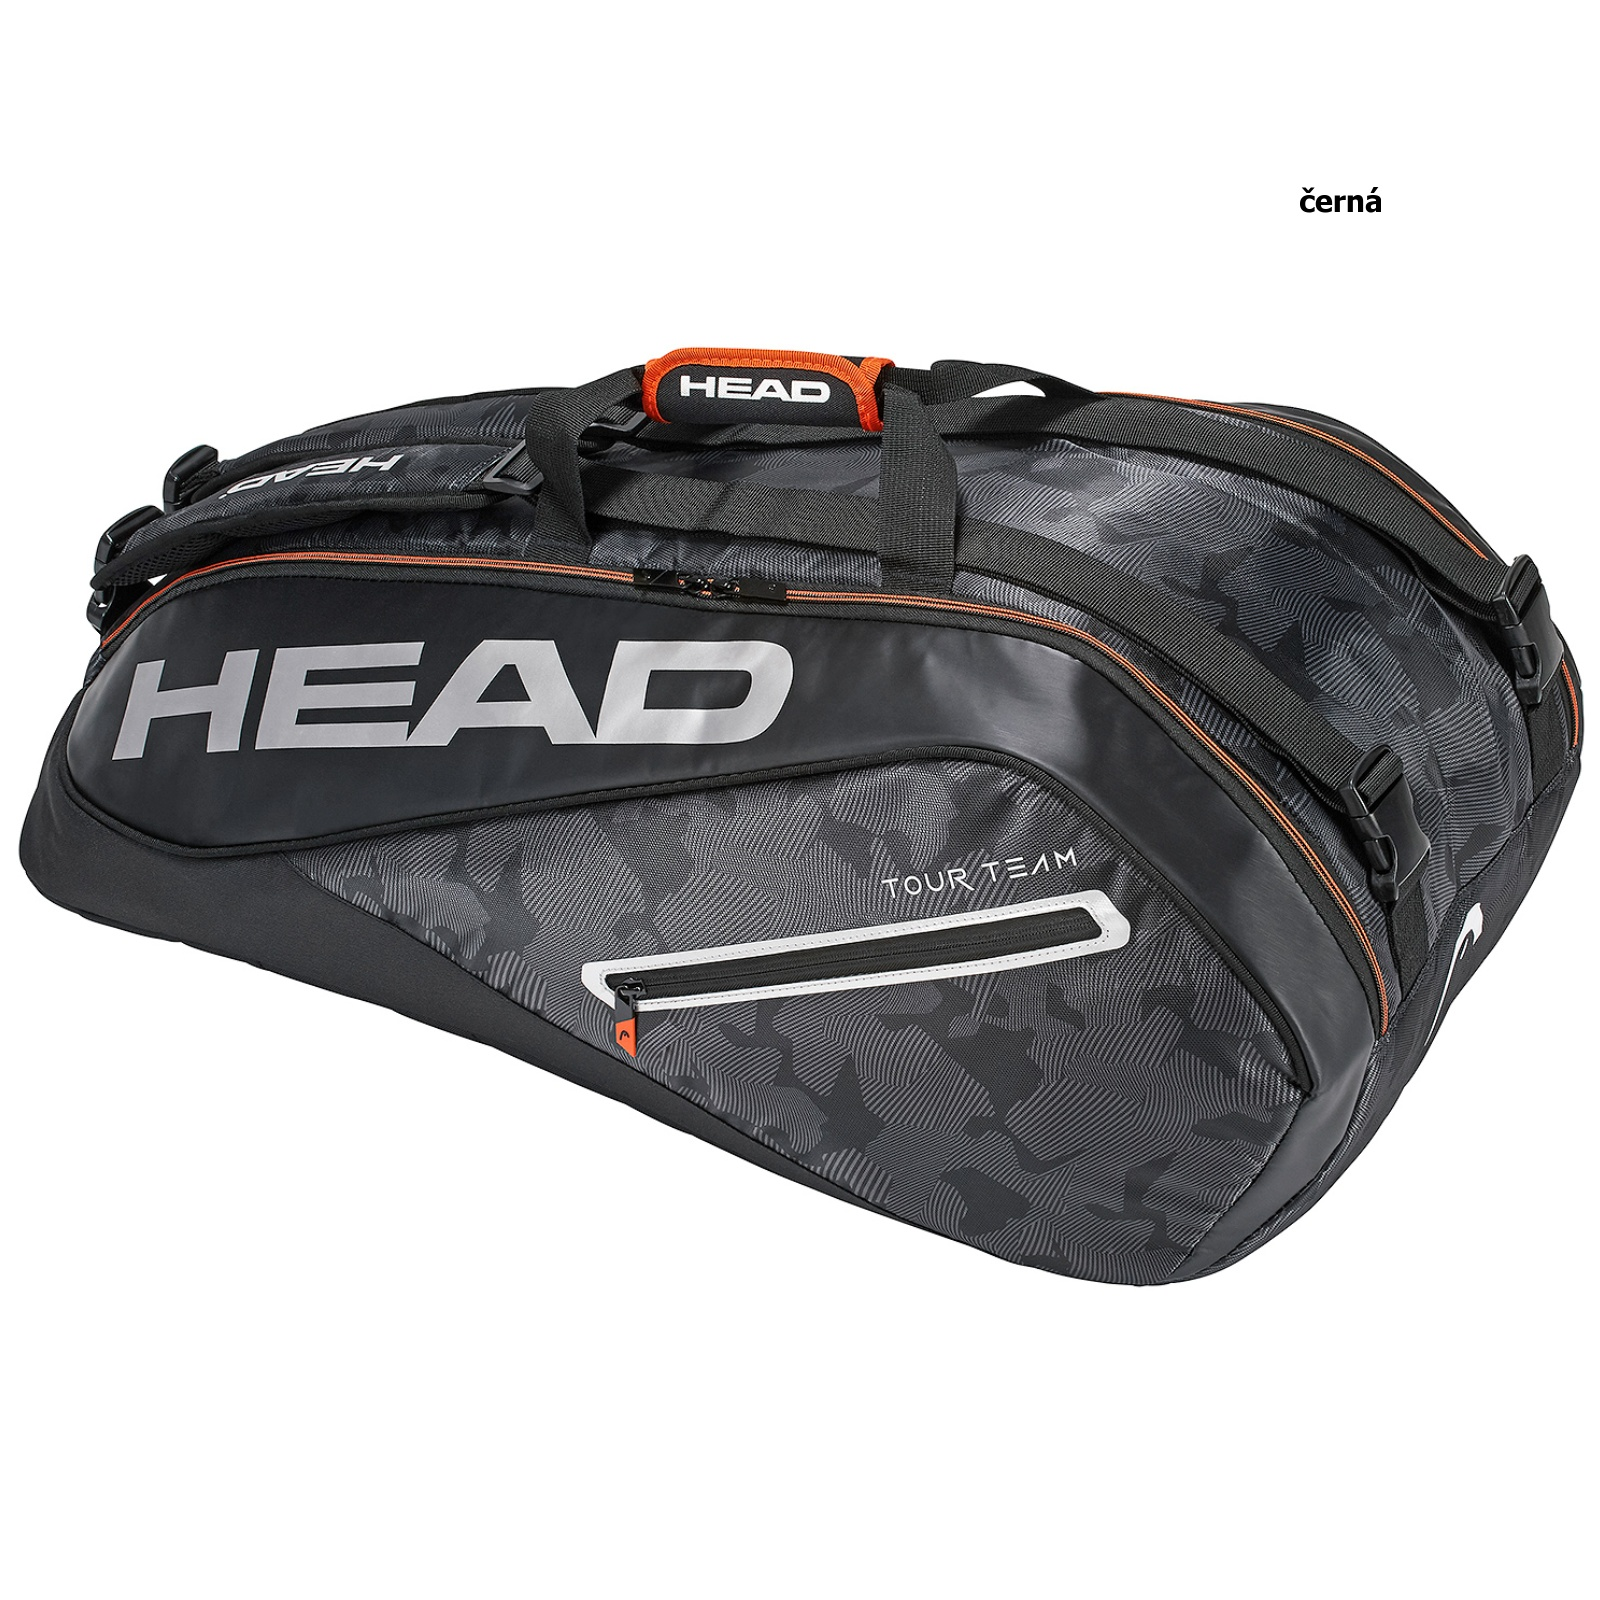 Tenisová taška HEAD Tour 9R Supercombi - černá